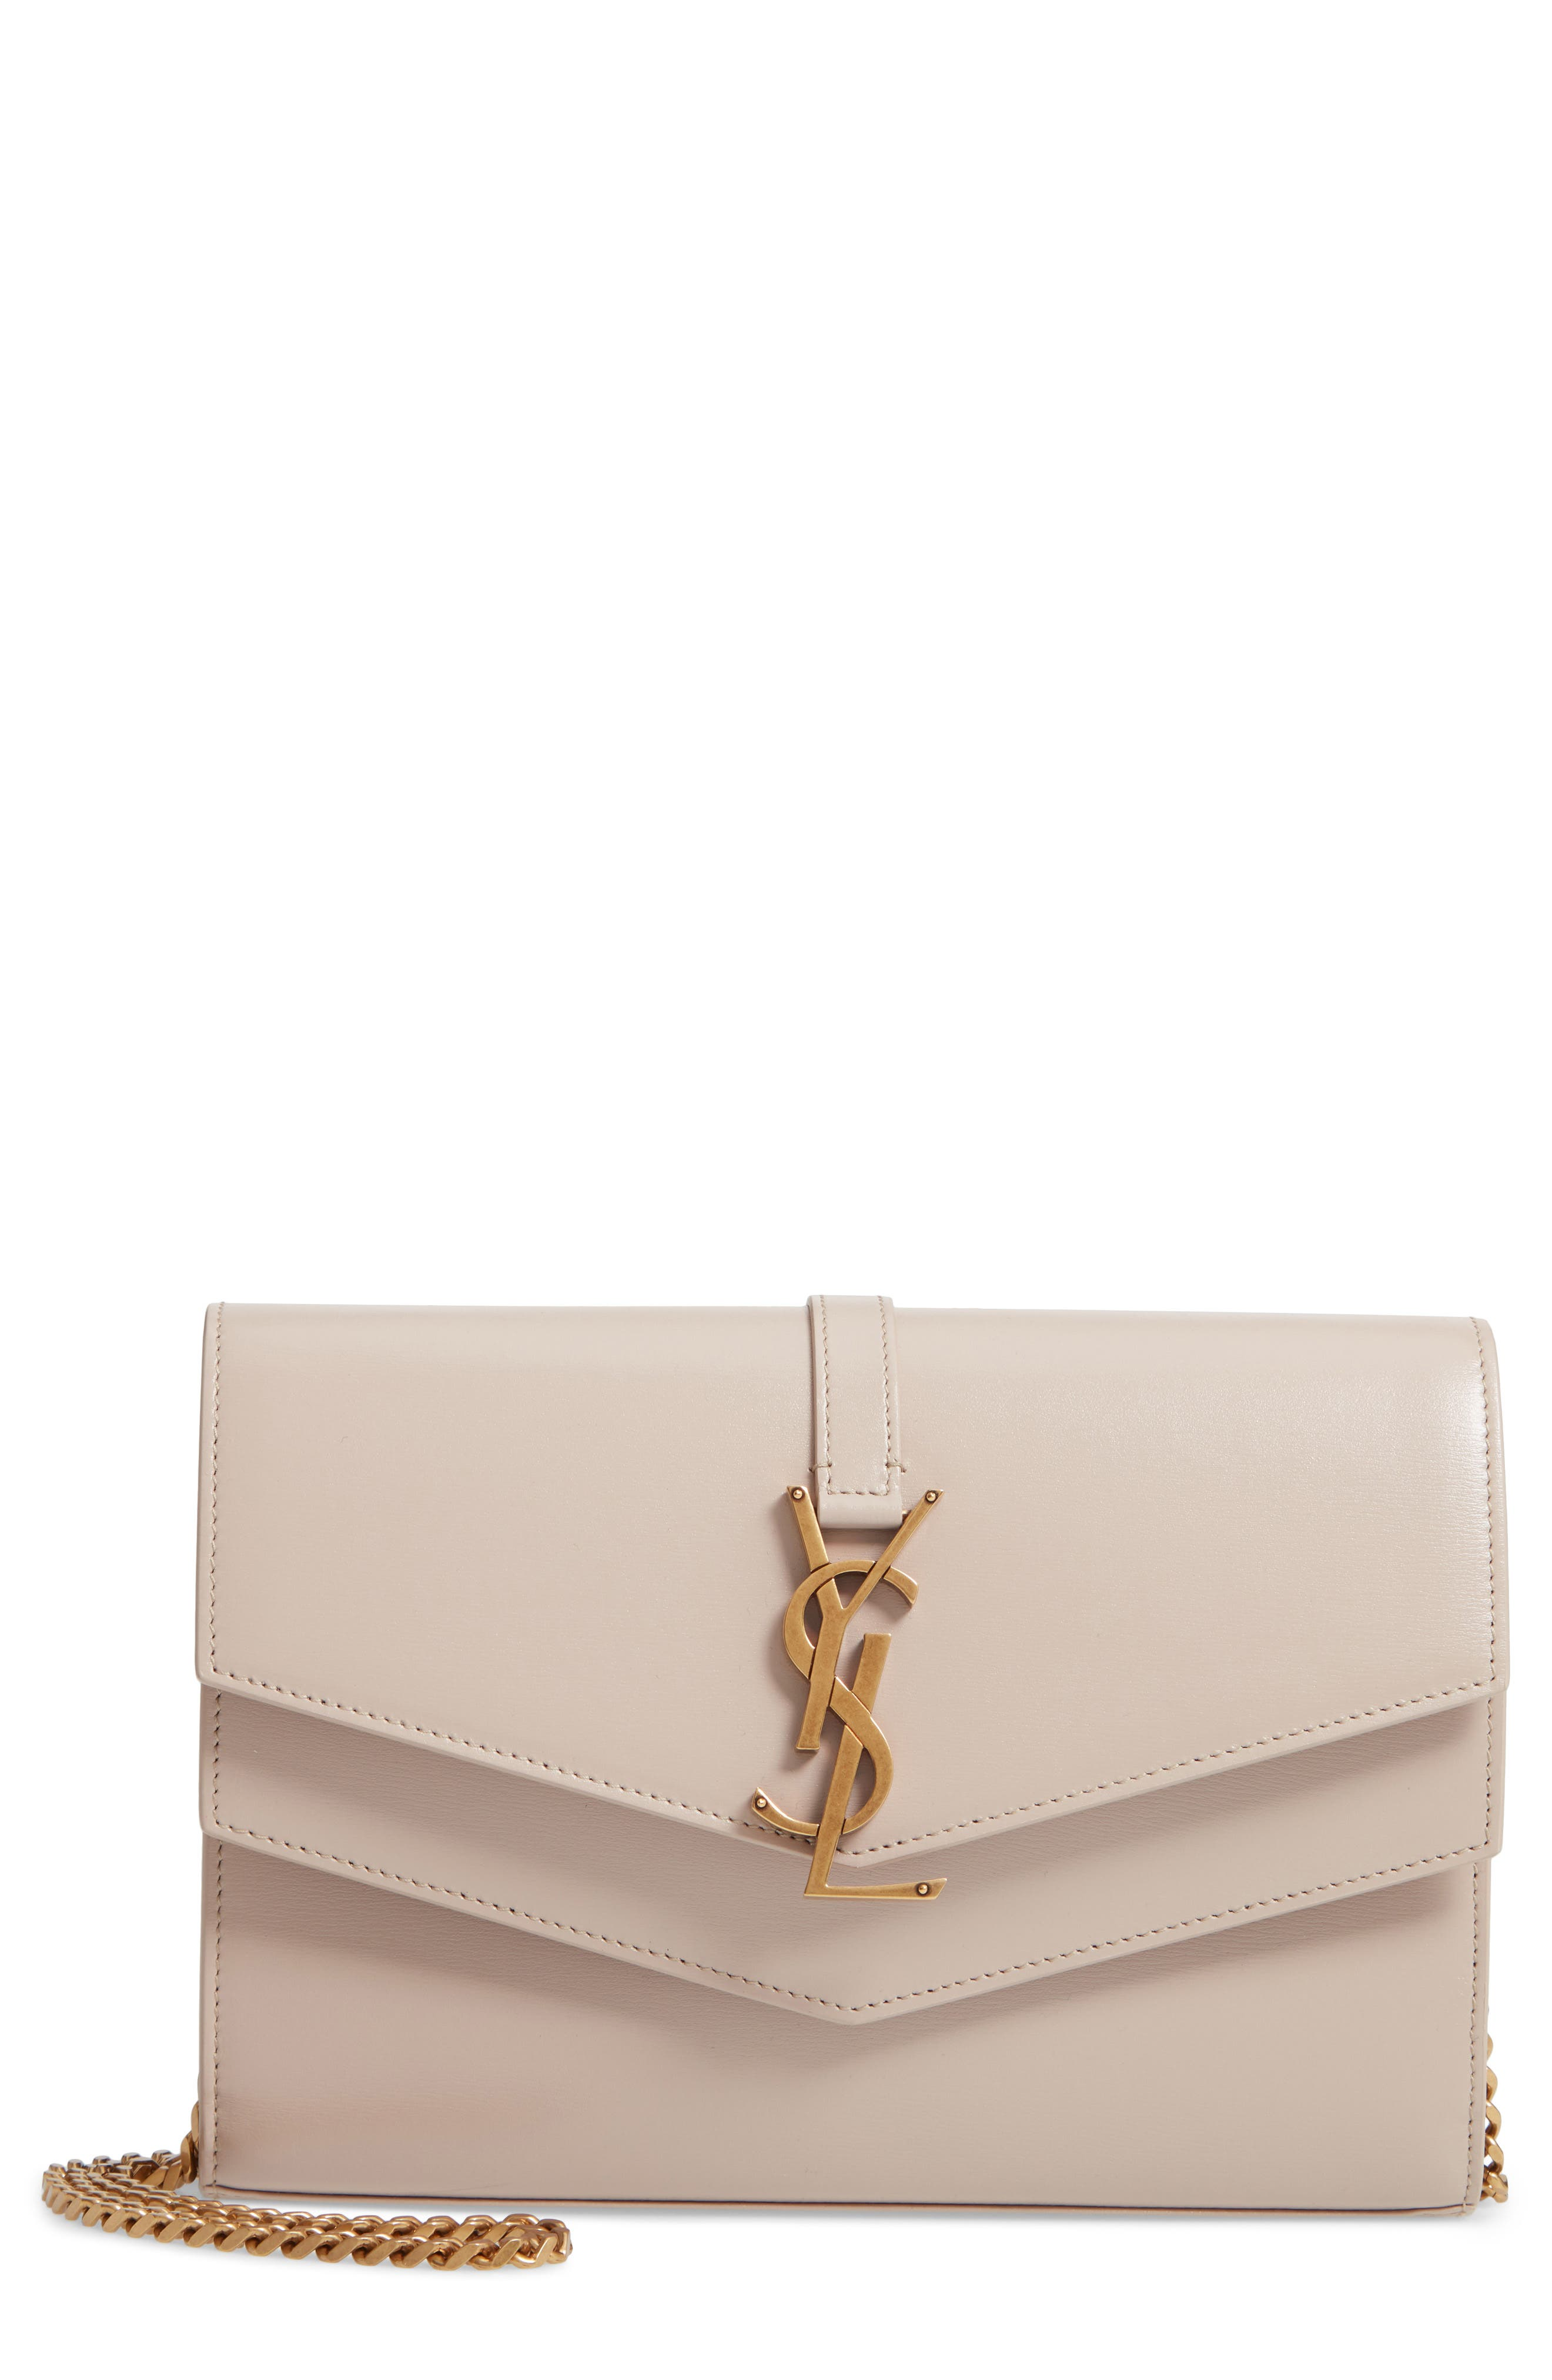 SAINT LAURENT, Sulpice Leather Crossbody Wallet, Main thumbnail 1, color, LIGHT NATURAL